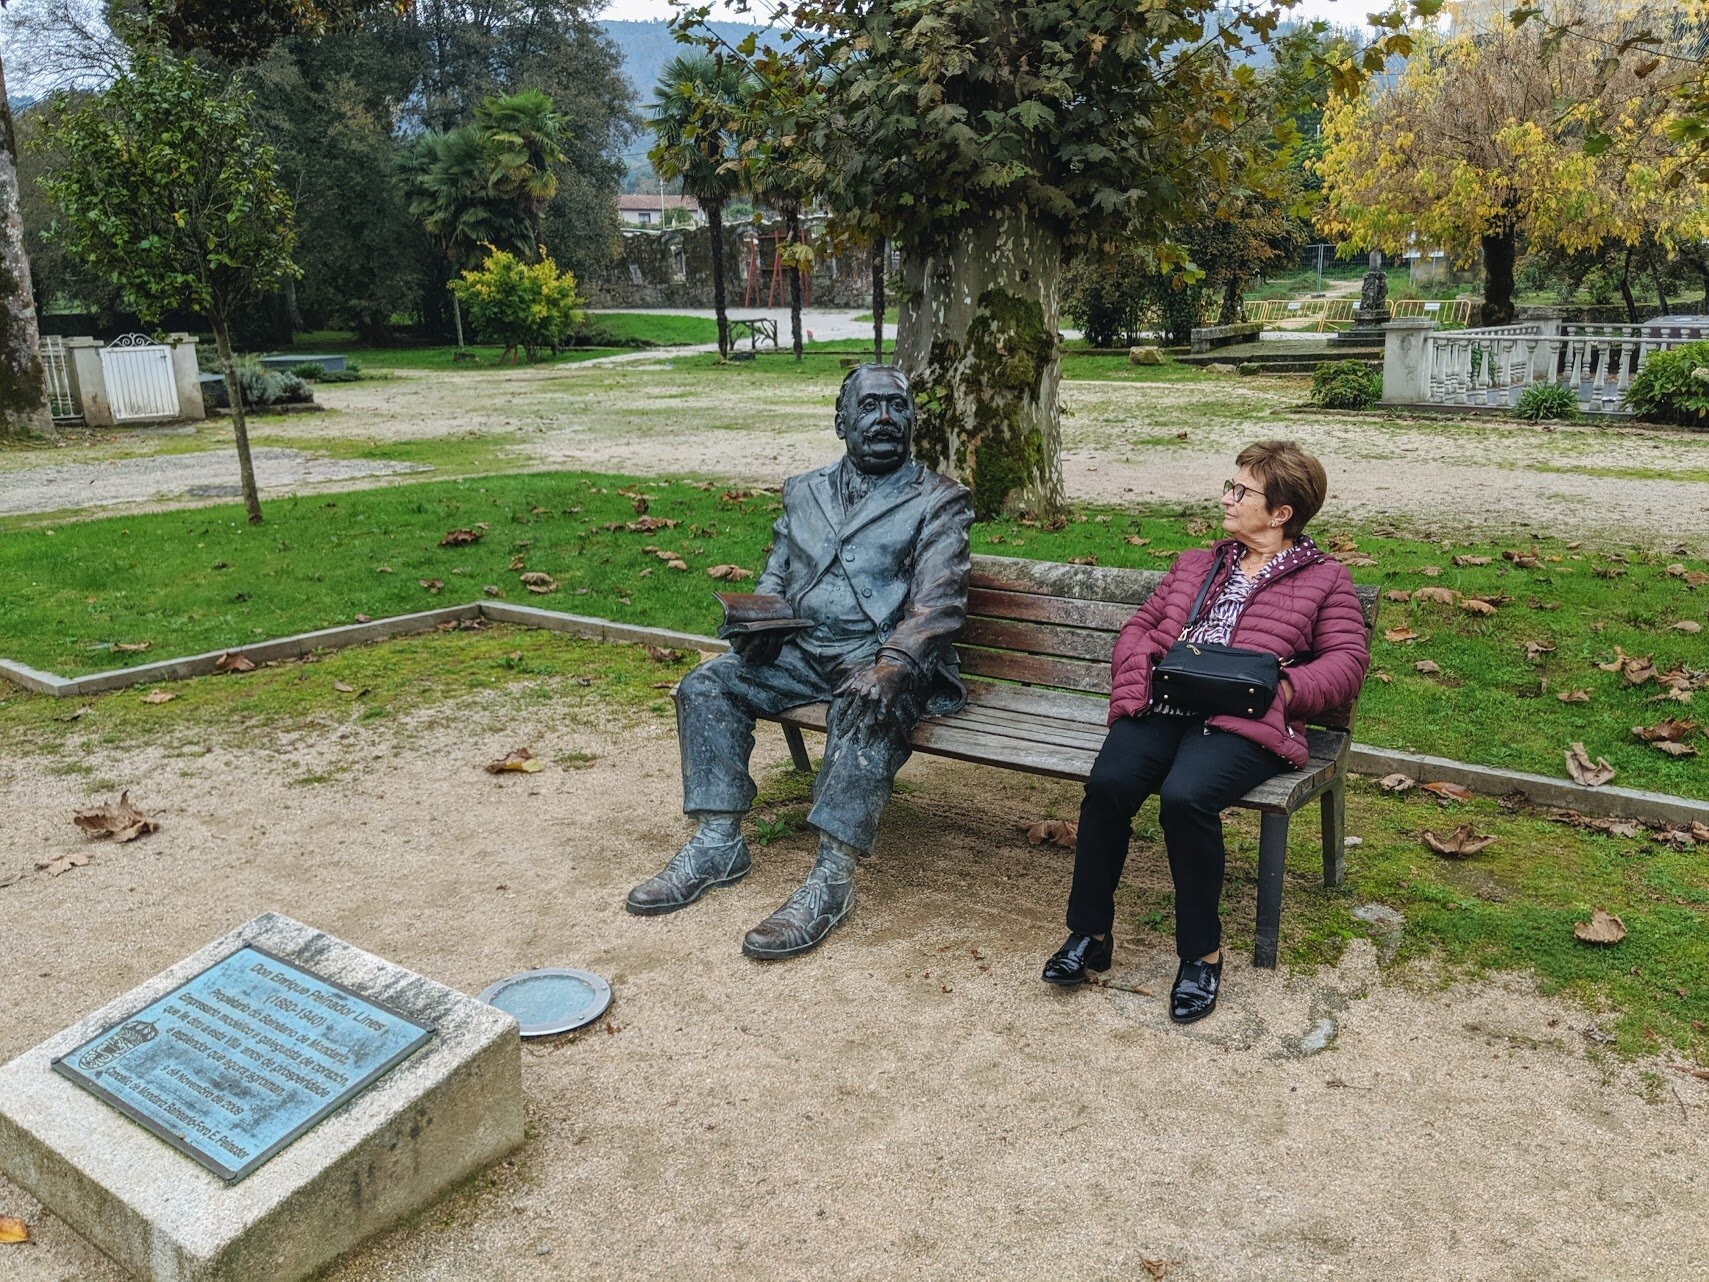 Mondariz, Pontevedra